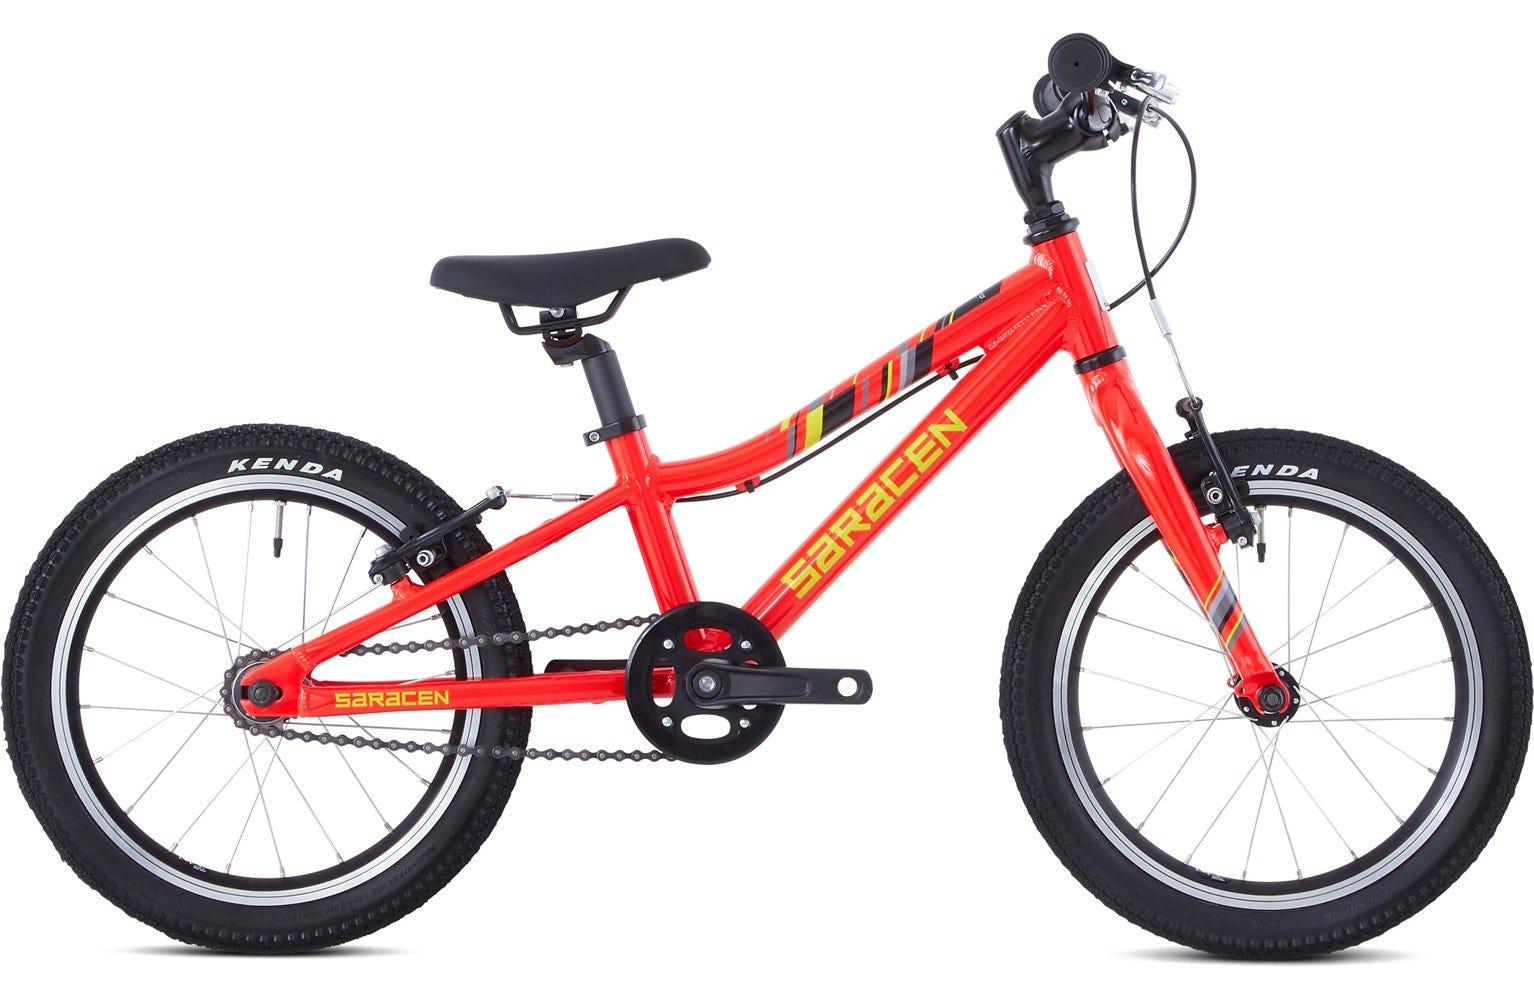 Saracen Mantra 1.6 - 16 inch Boys bike